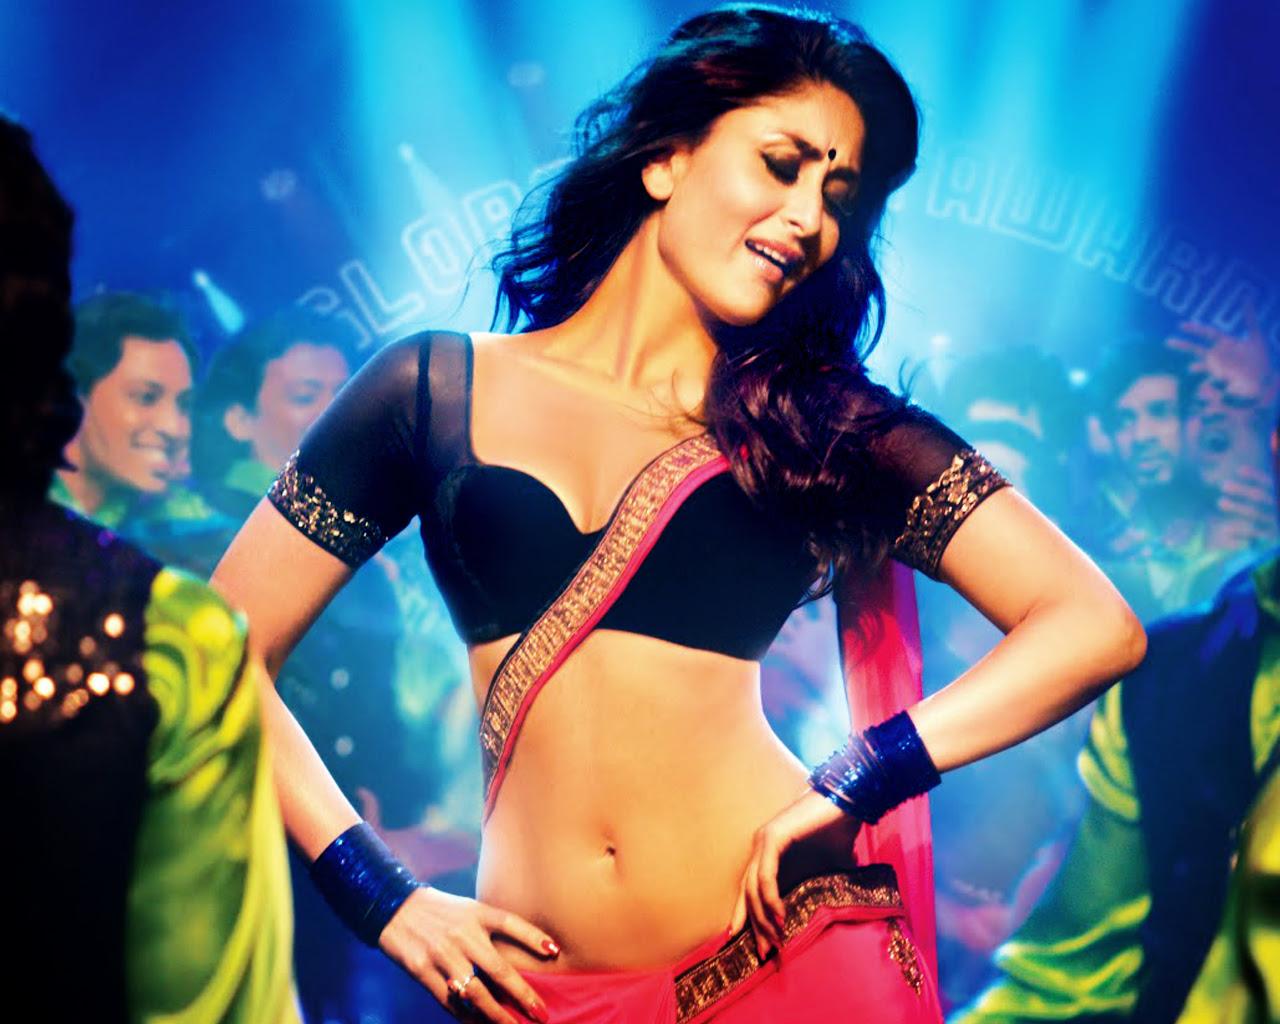 Heroine Wallpaper Bollywood Wallpaper 32125919 Fanpop